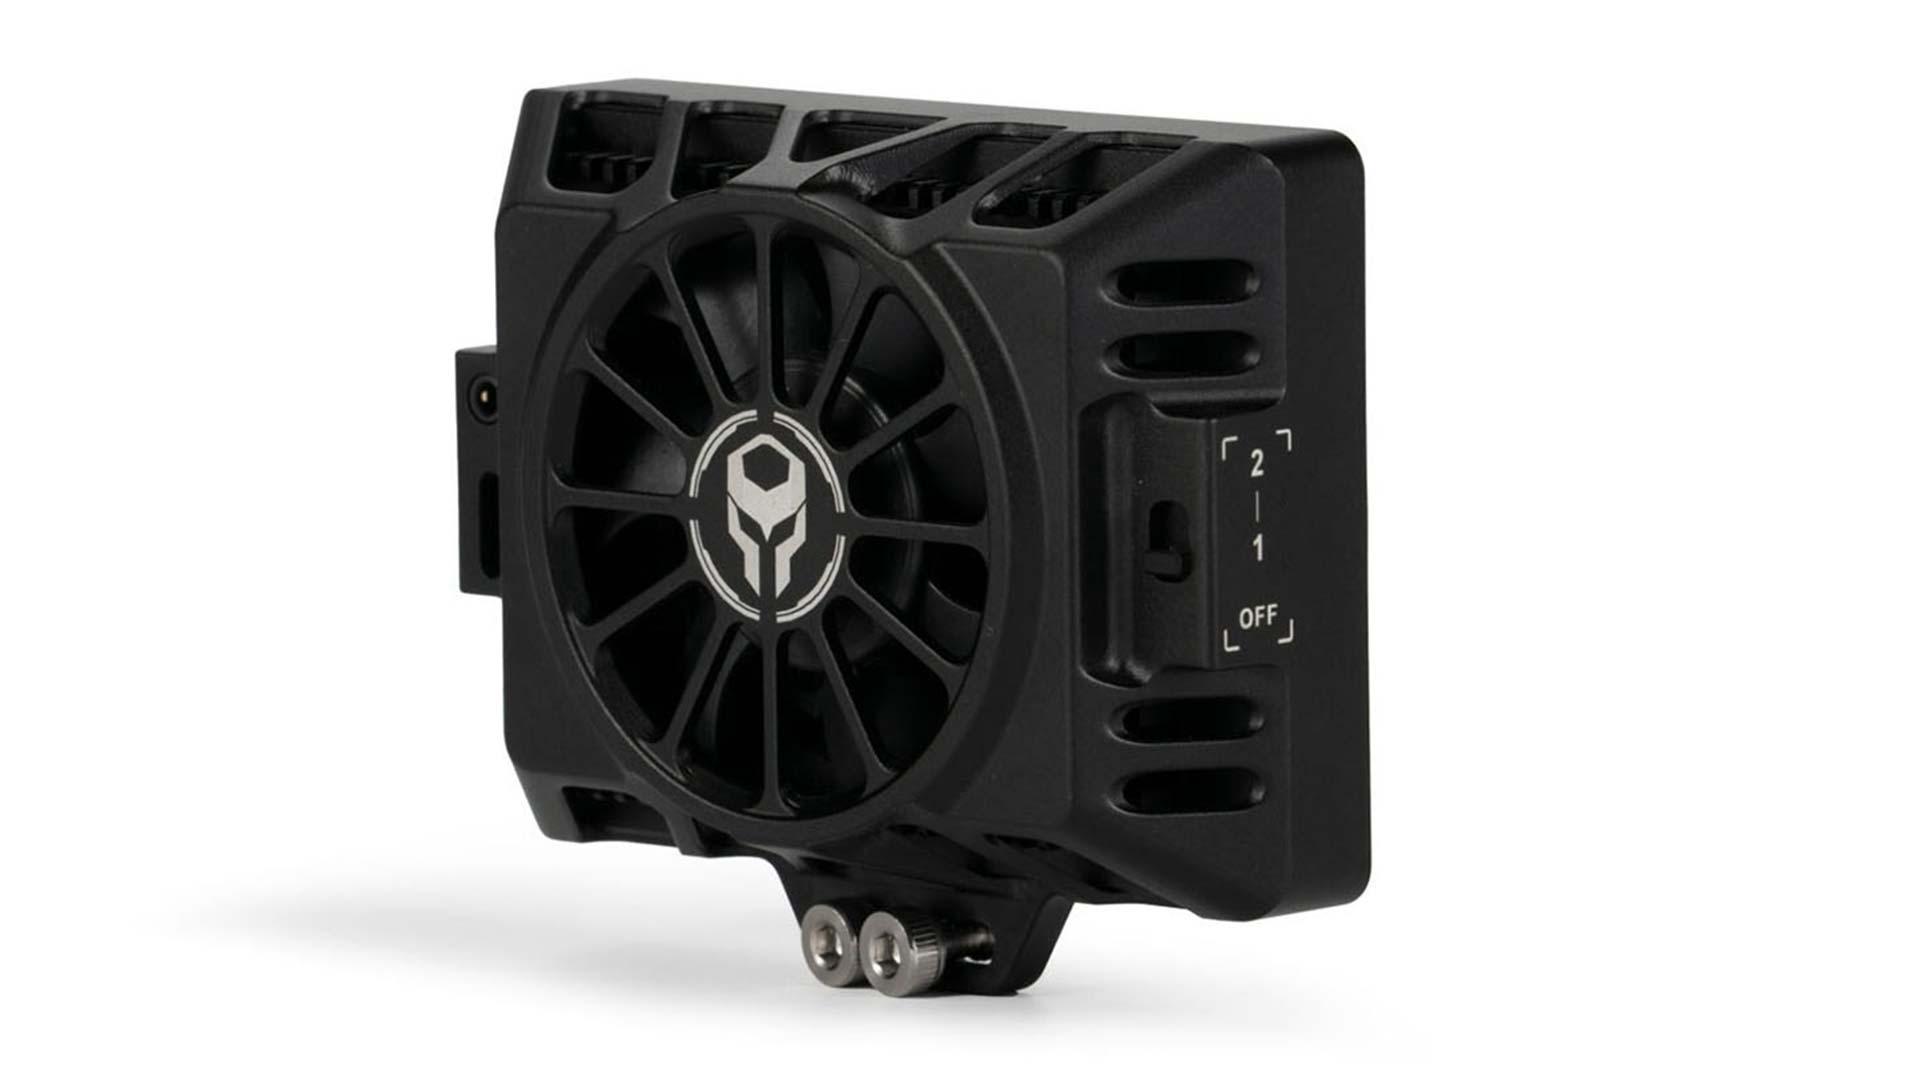 Tilta's new fan cooling system for the EOS R5. Image: Tilta.